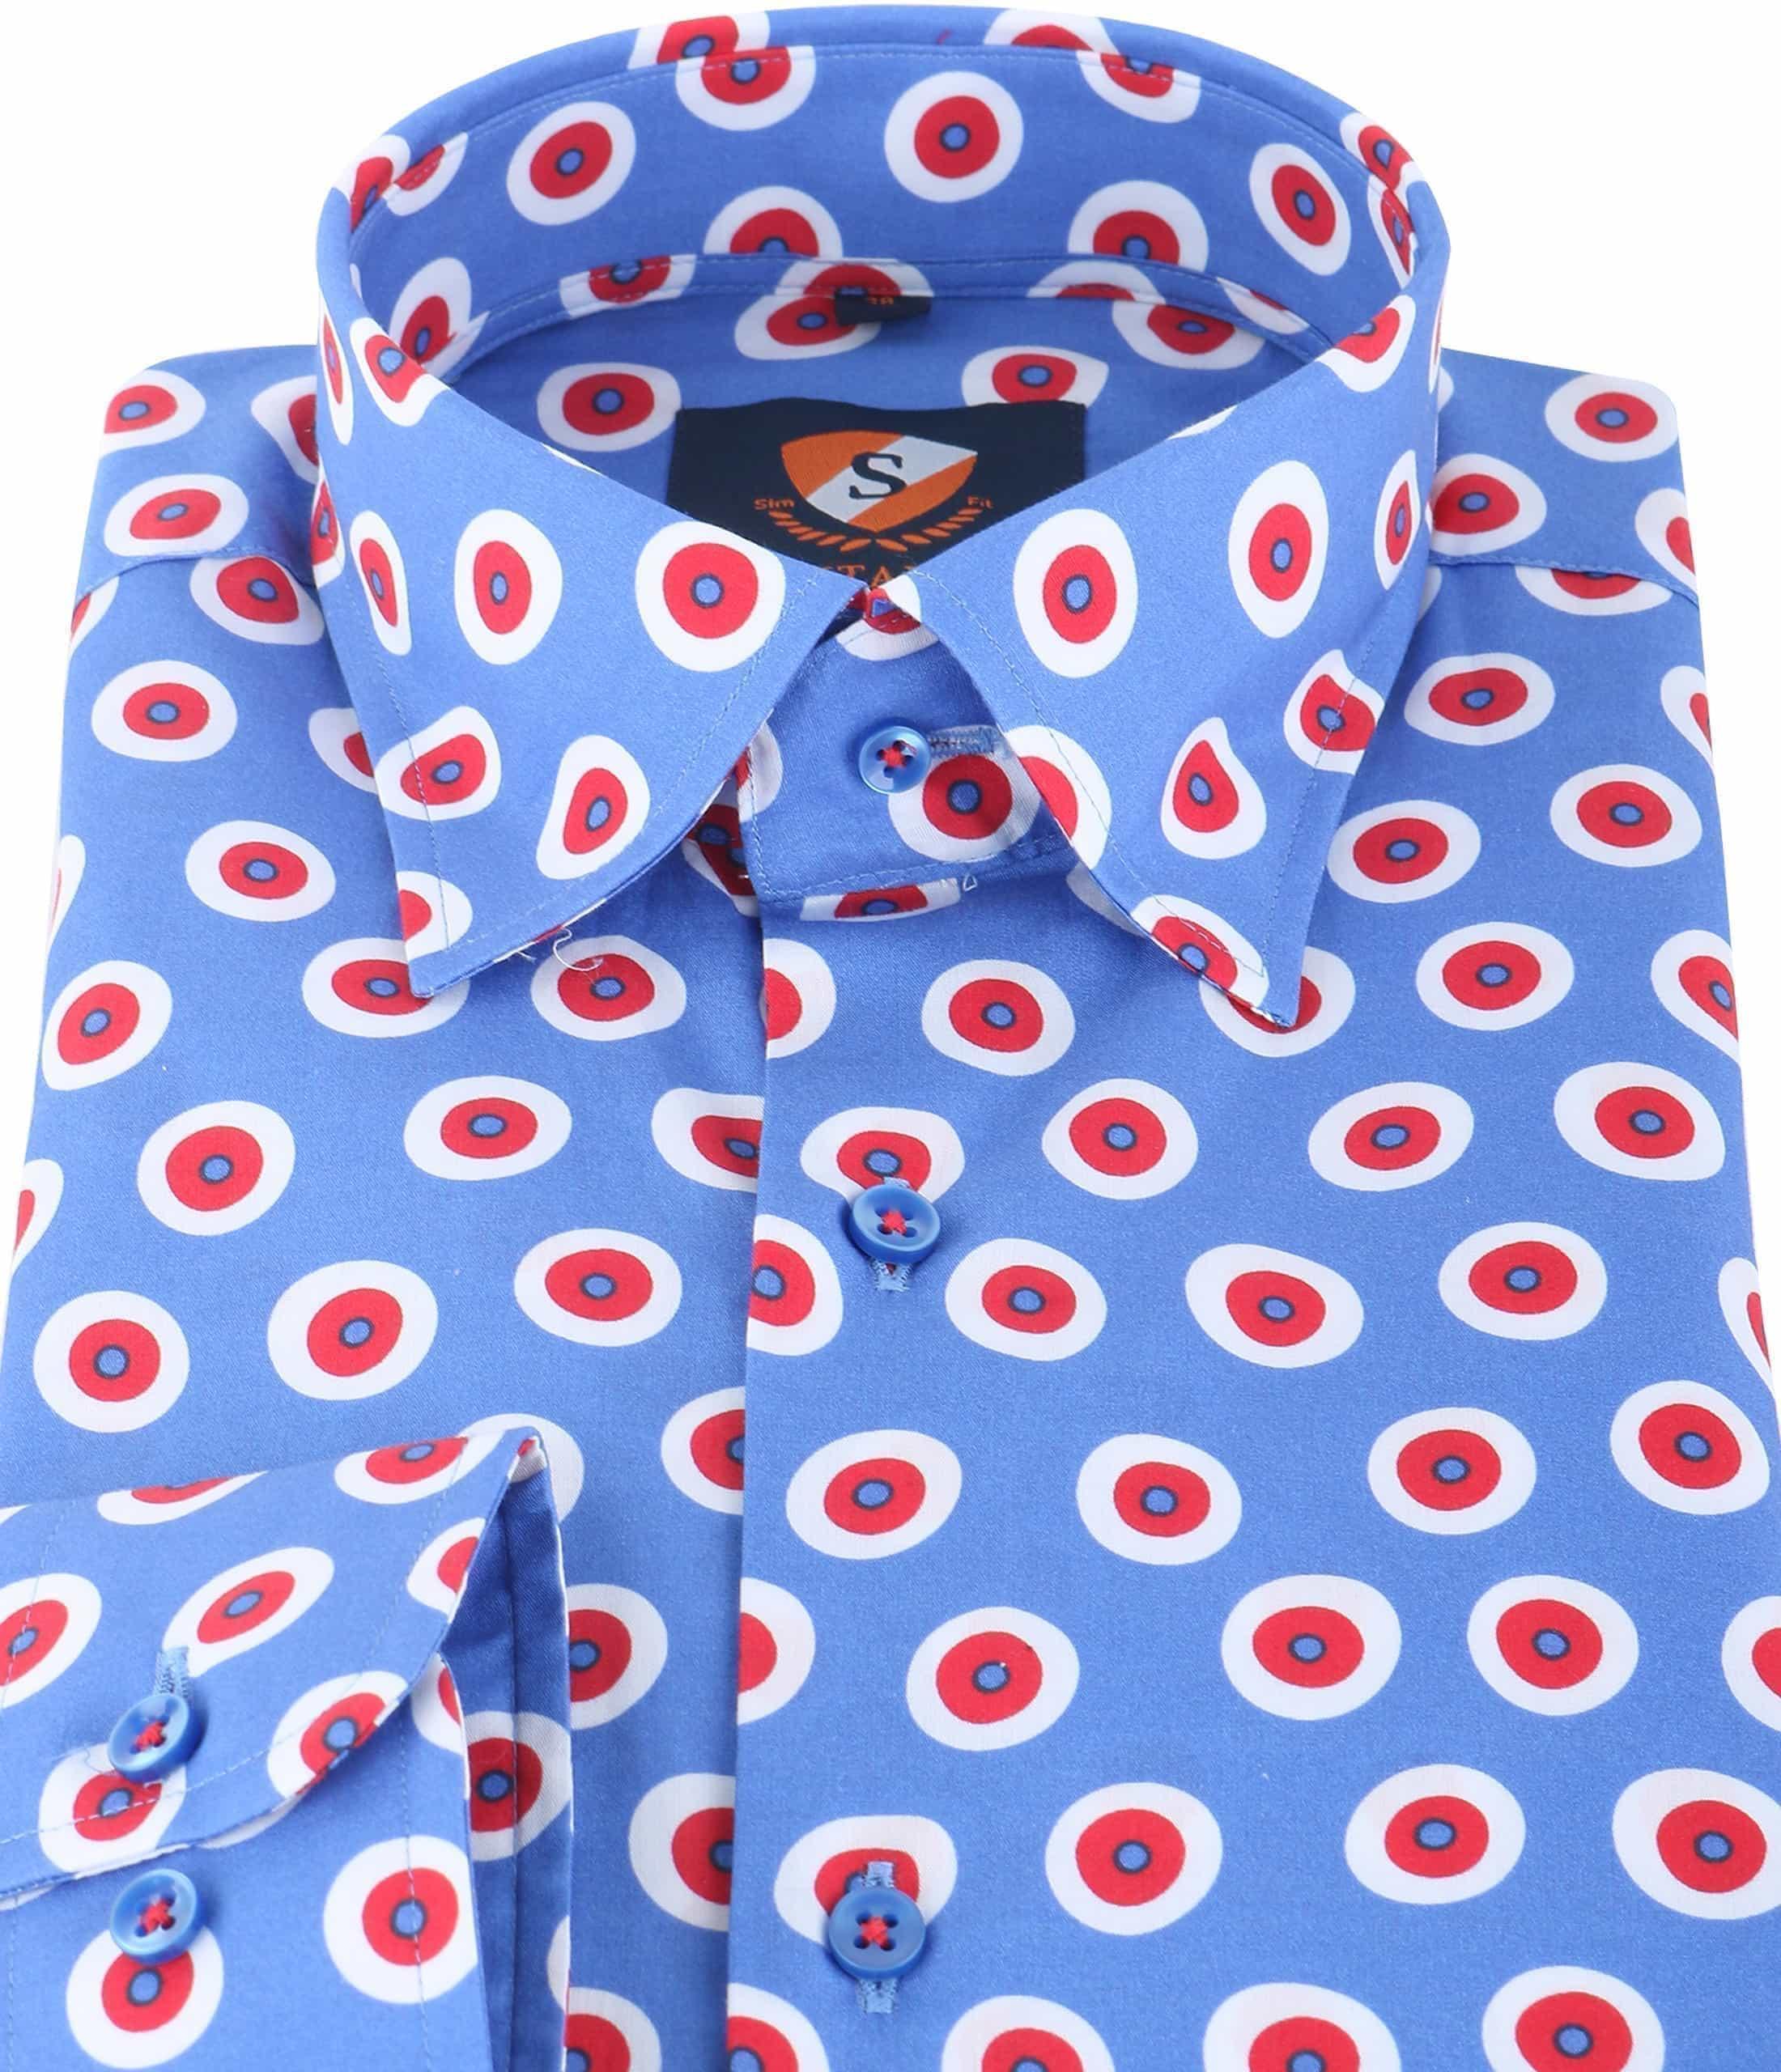 Suitable Overhemd Blauw Rood 141-4 foto 1